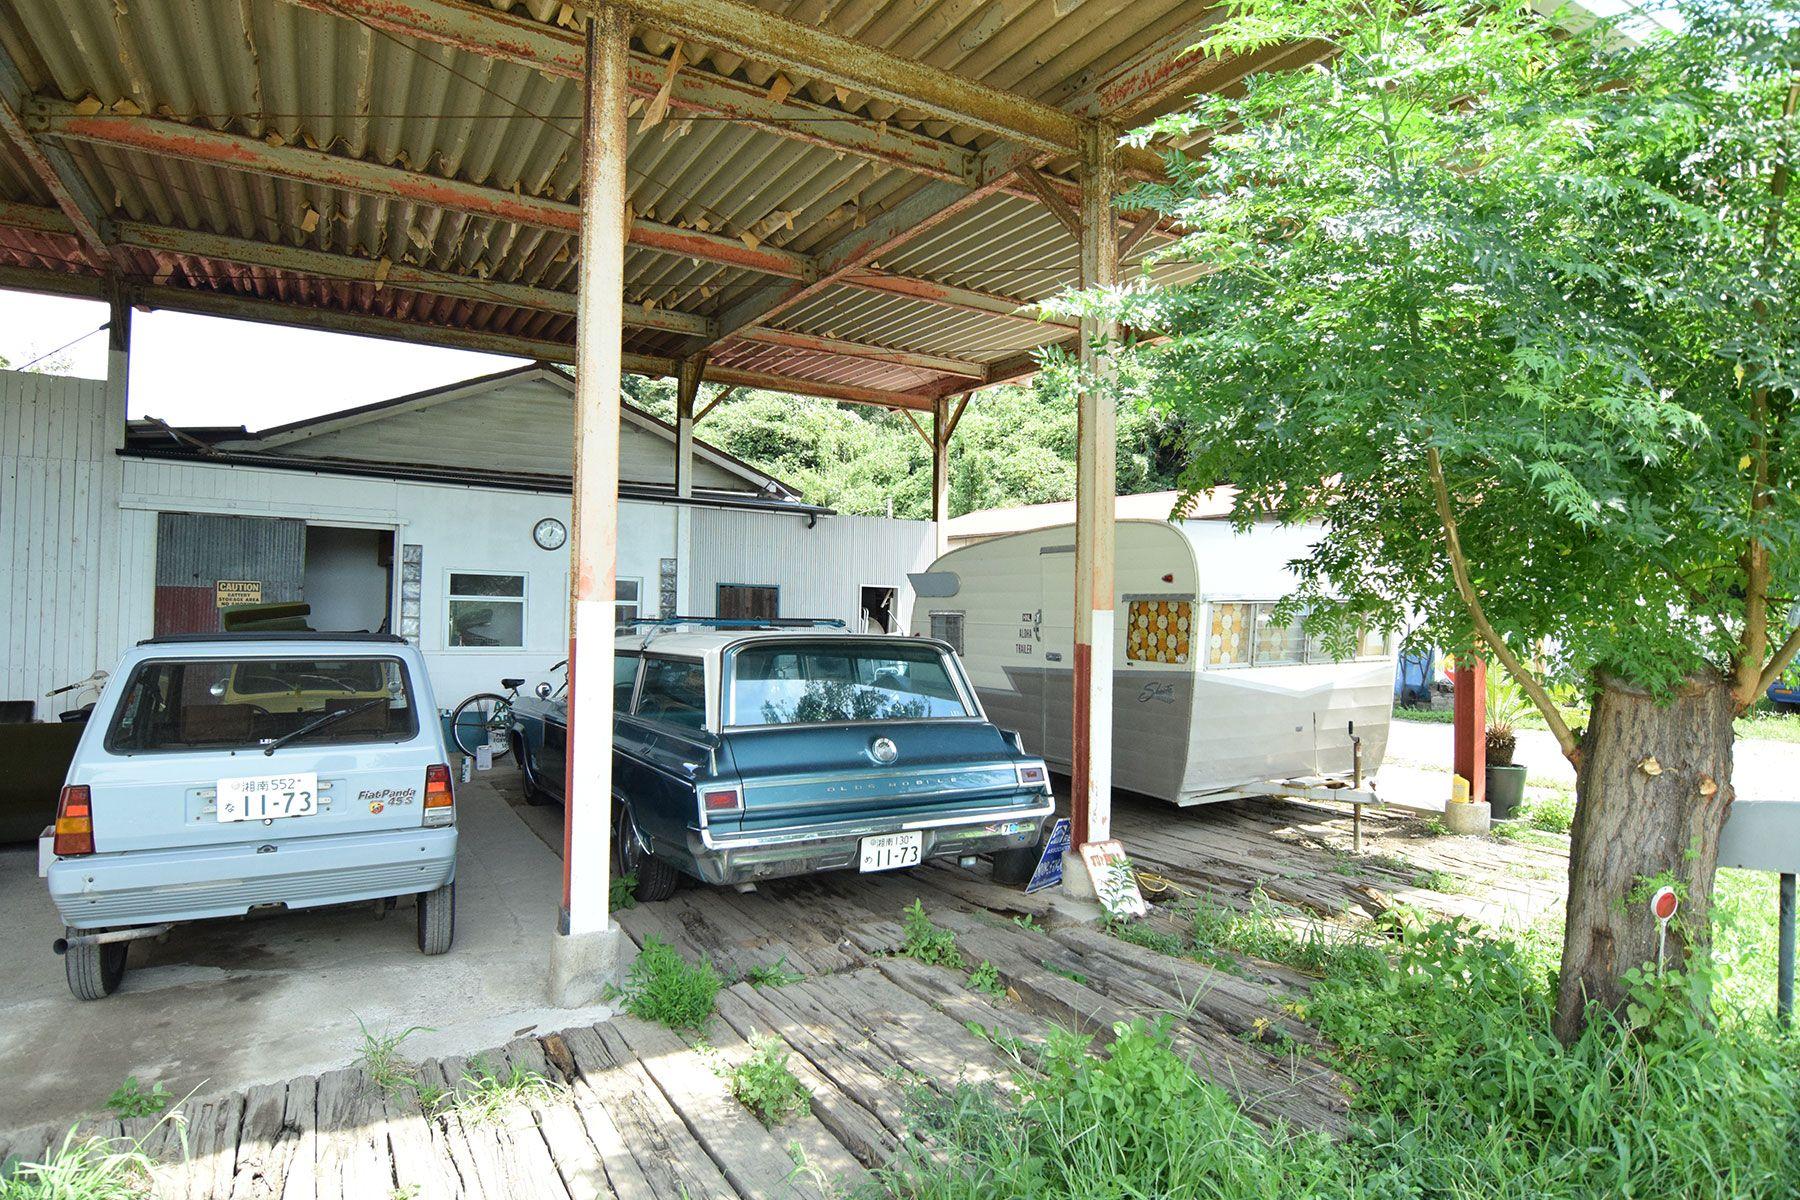 STUDIO LOPEZ 茅ヶ崎スペース (スタジオ ロペス)200本の枕木を敷き詰めたガレージ